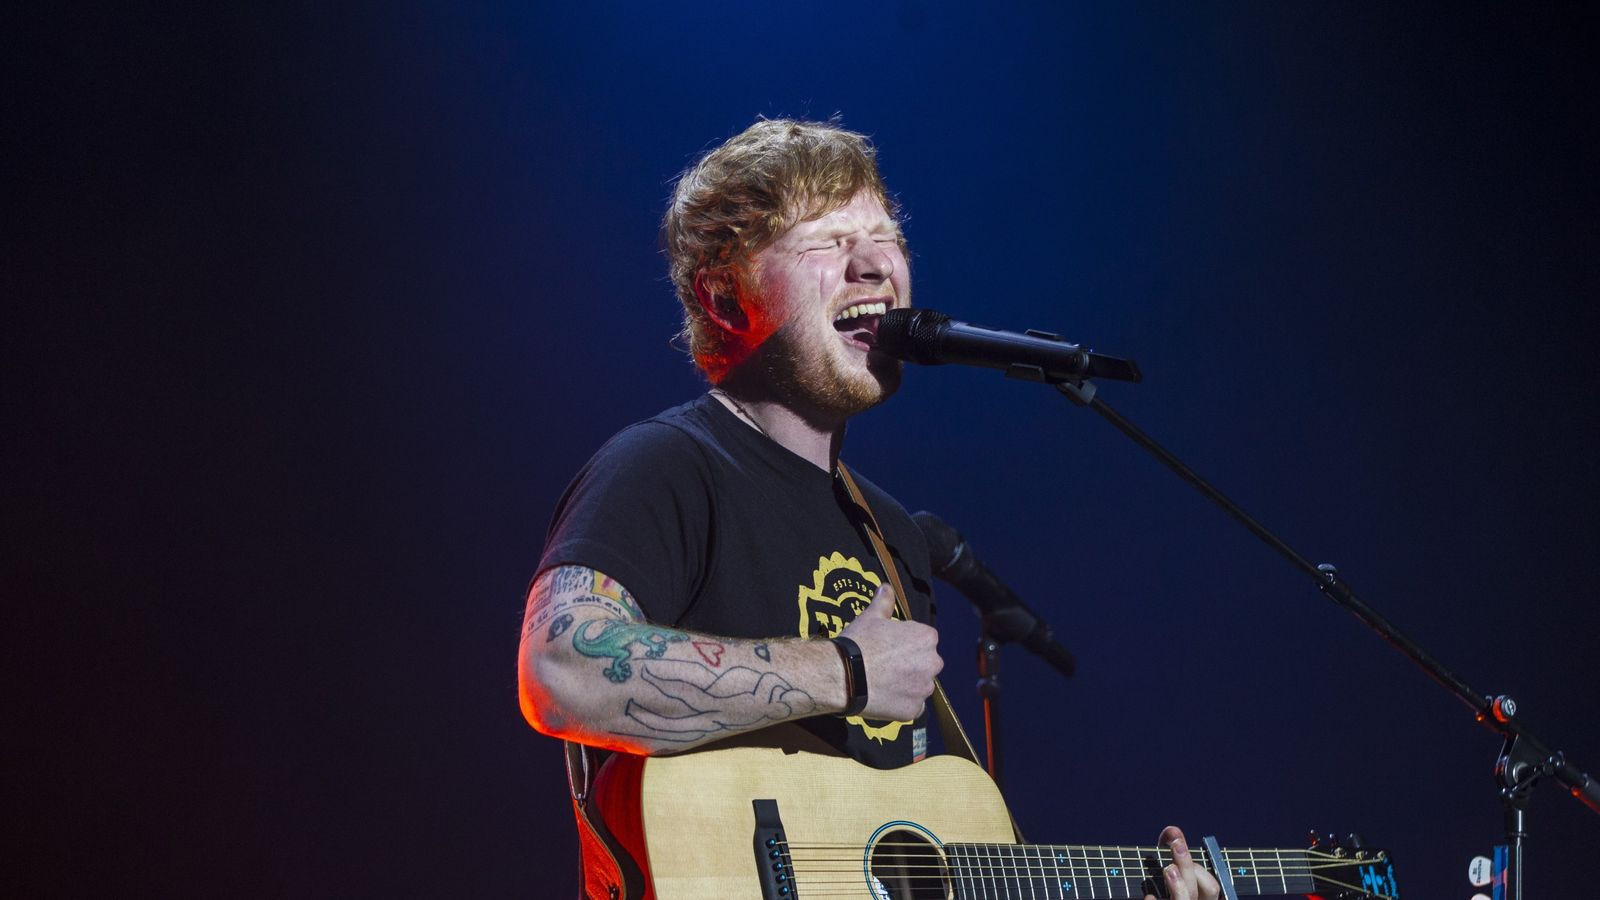 Sheeran settles £15m breach of copyright lawsuit